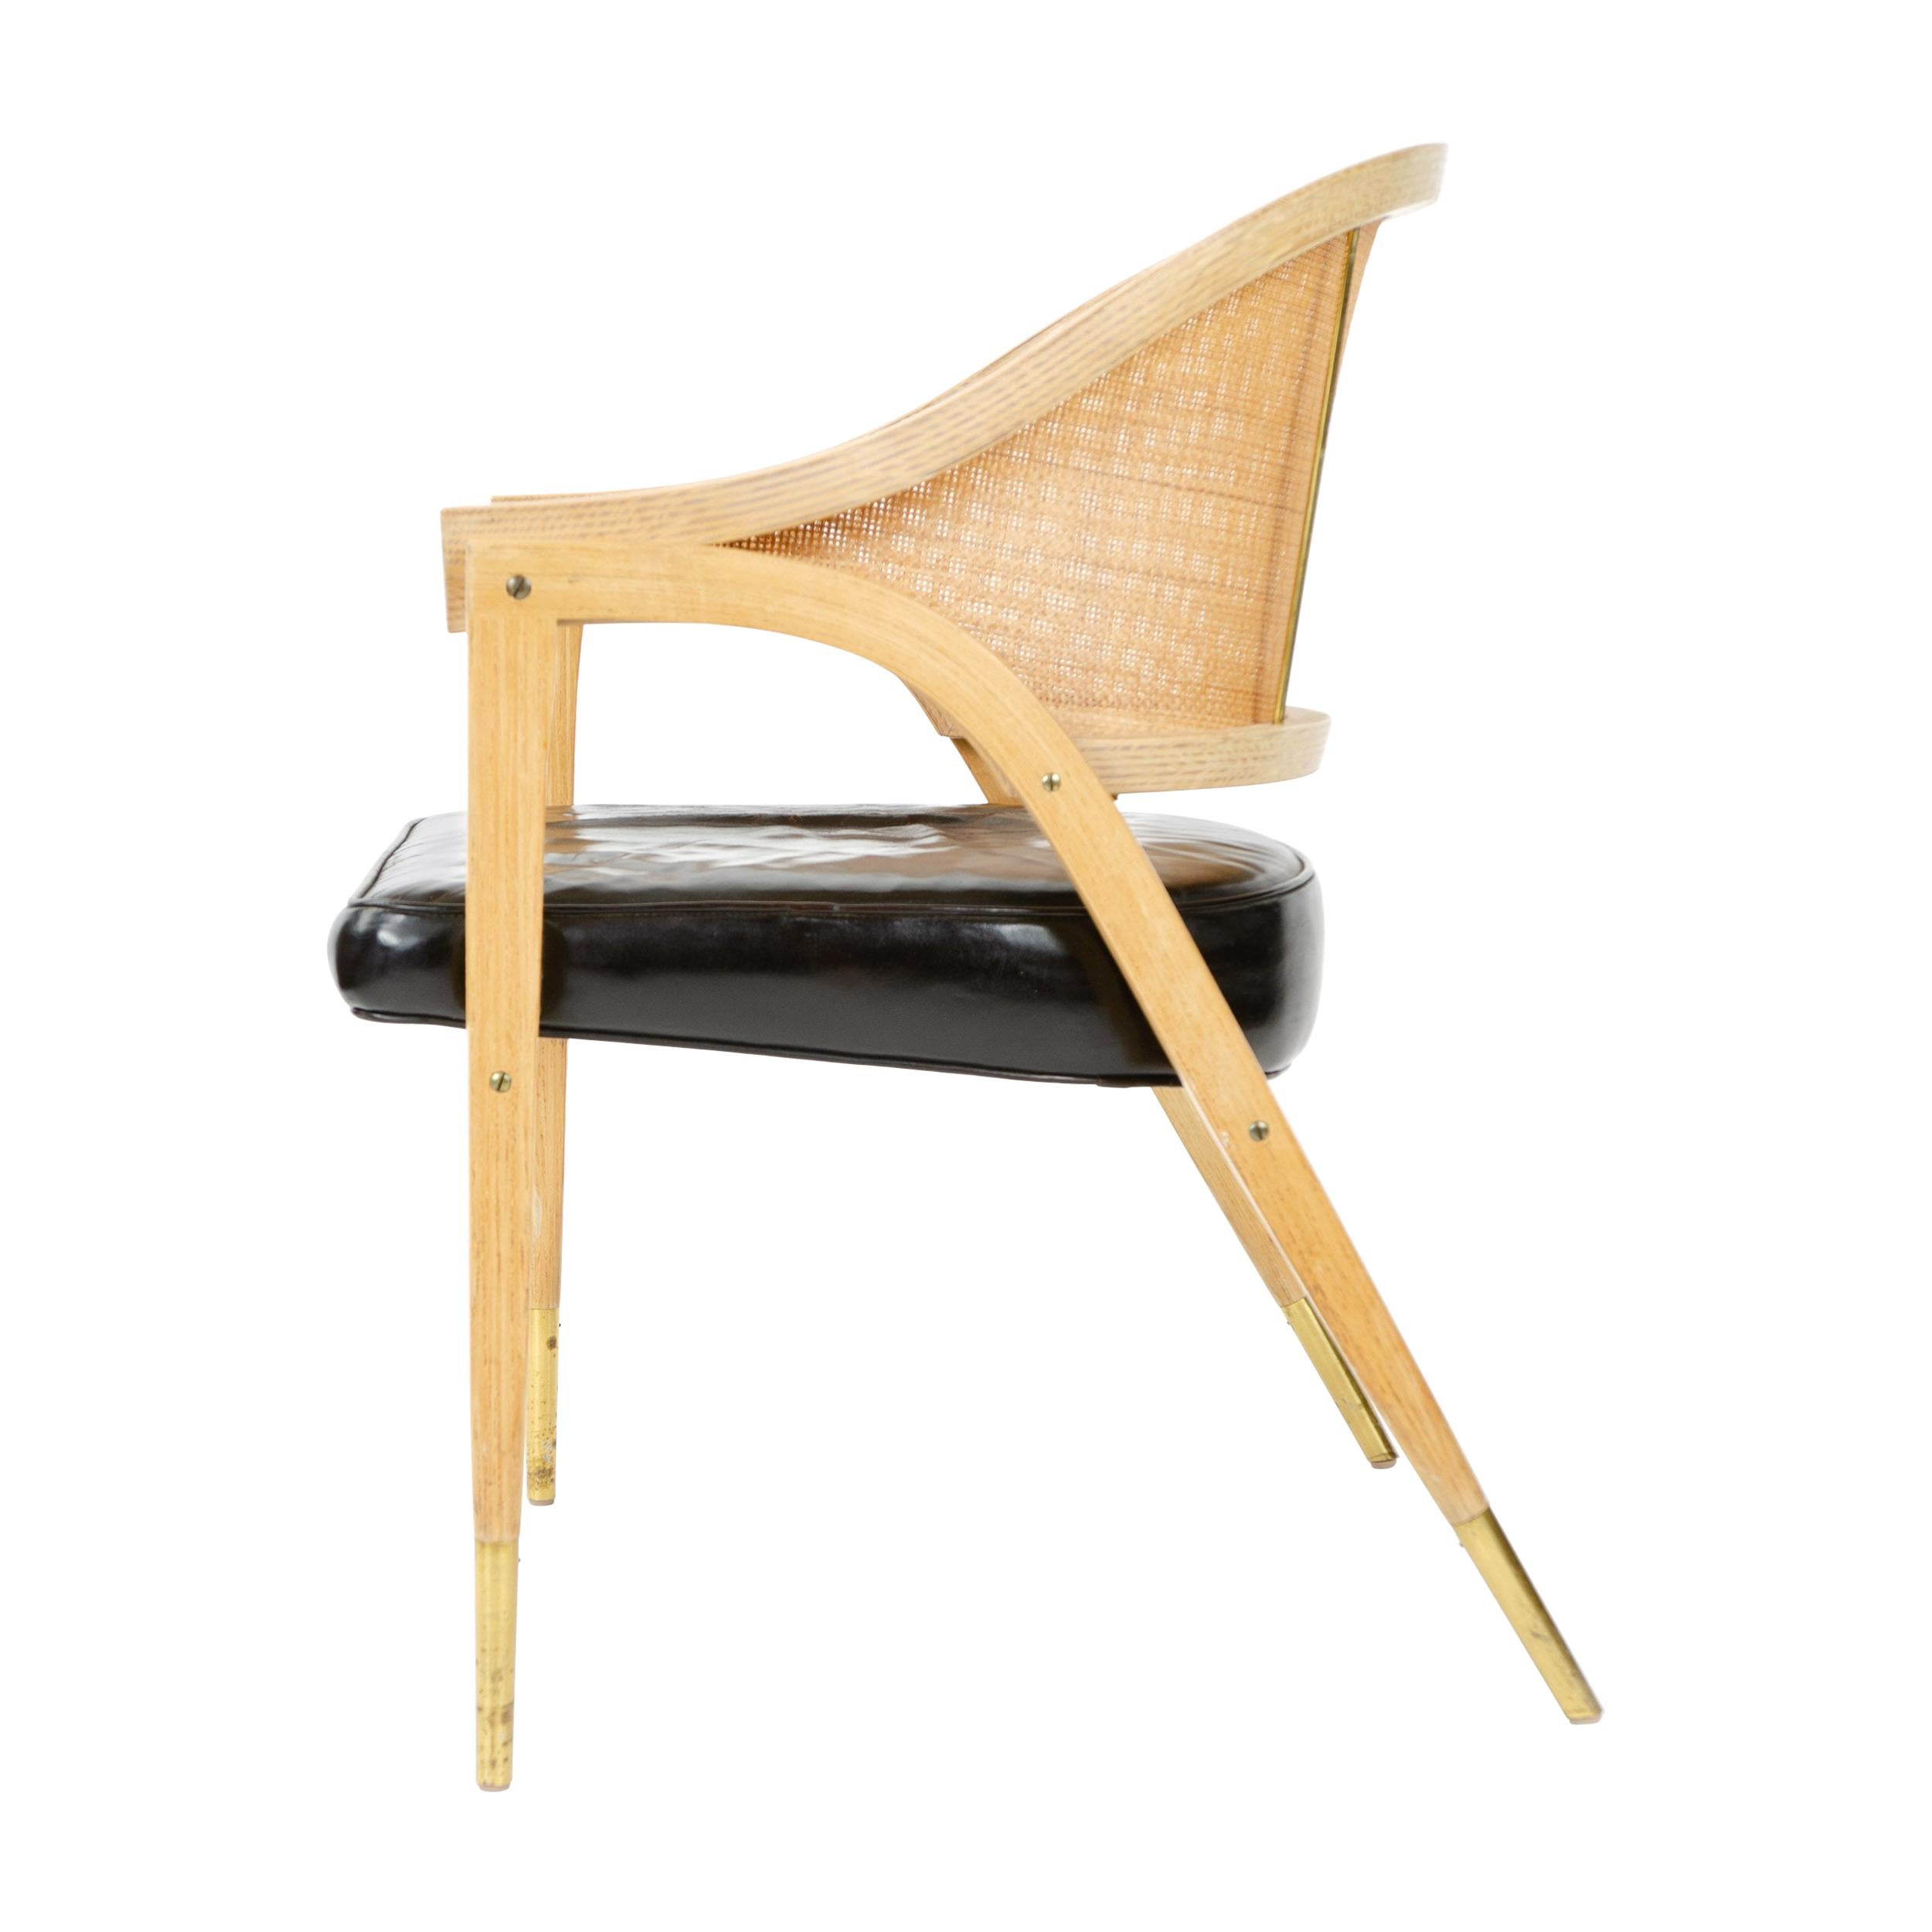 'A-Frame' Chair by Edward Wormley for Dunbar